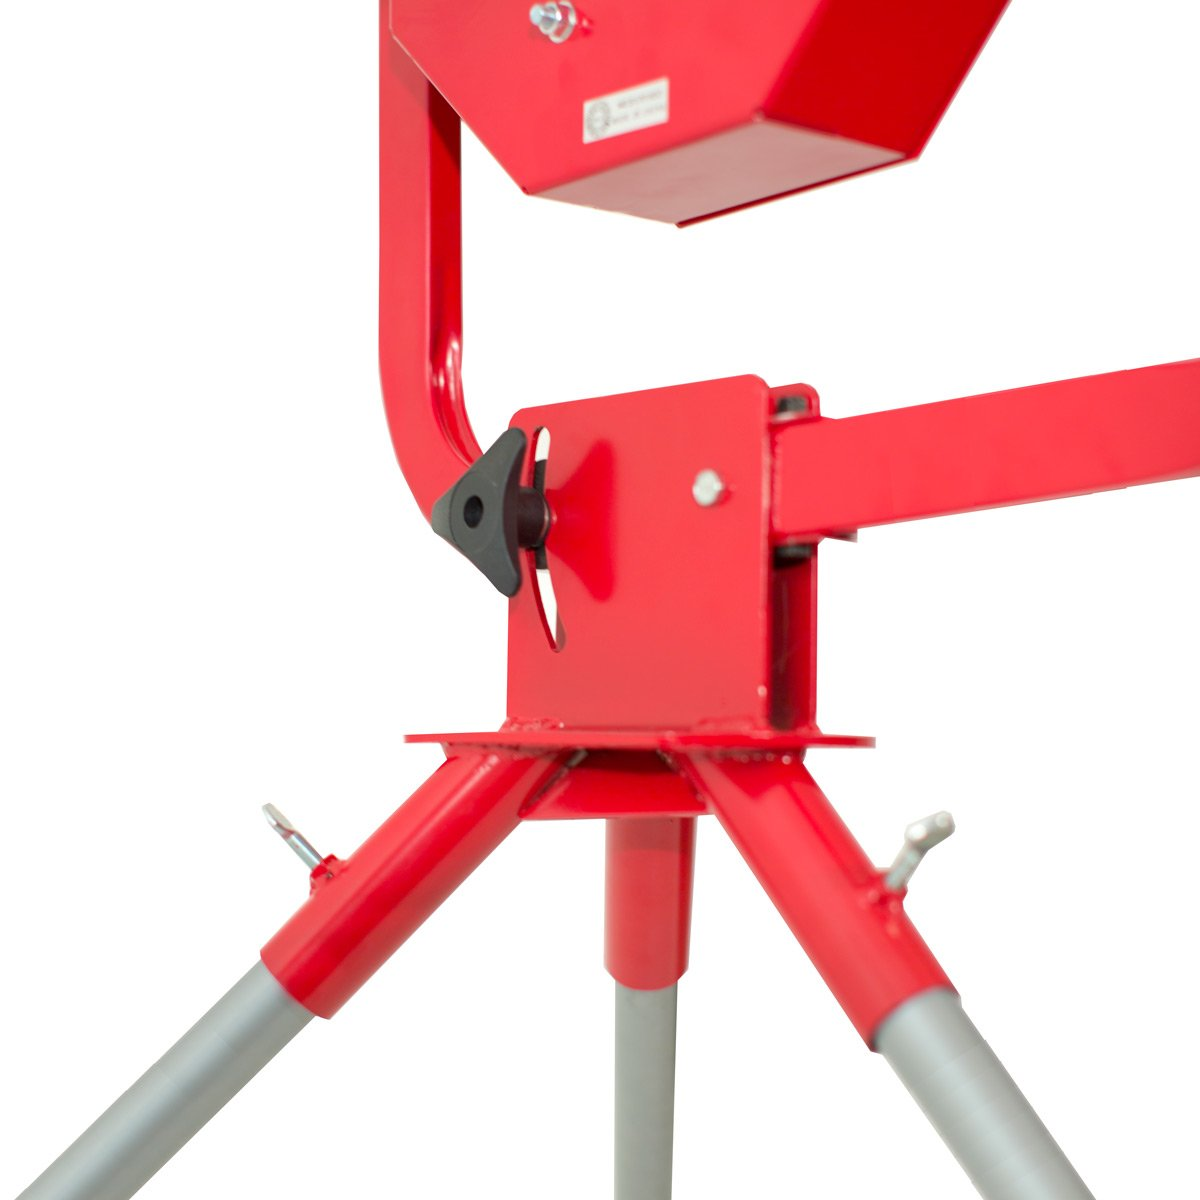 Deuce 95 MPH 2 Wheel Curveball Machine With Auto Ballfeeder